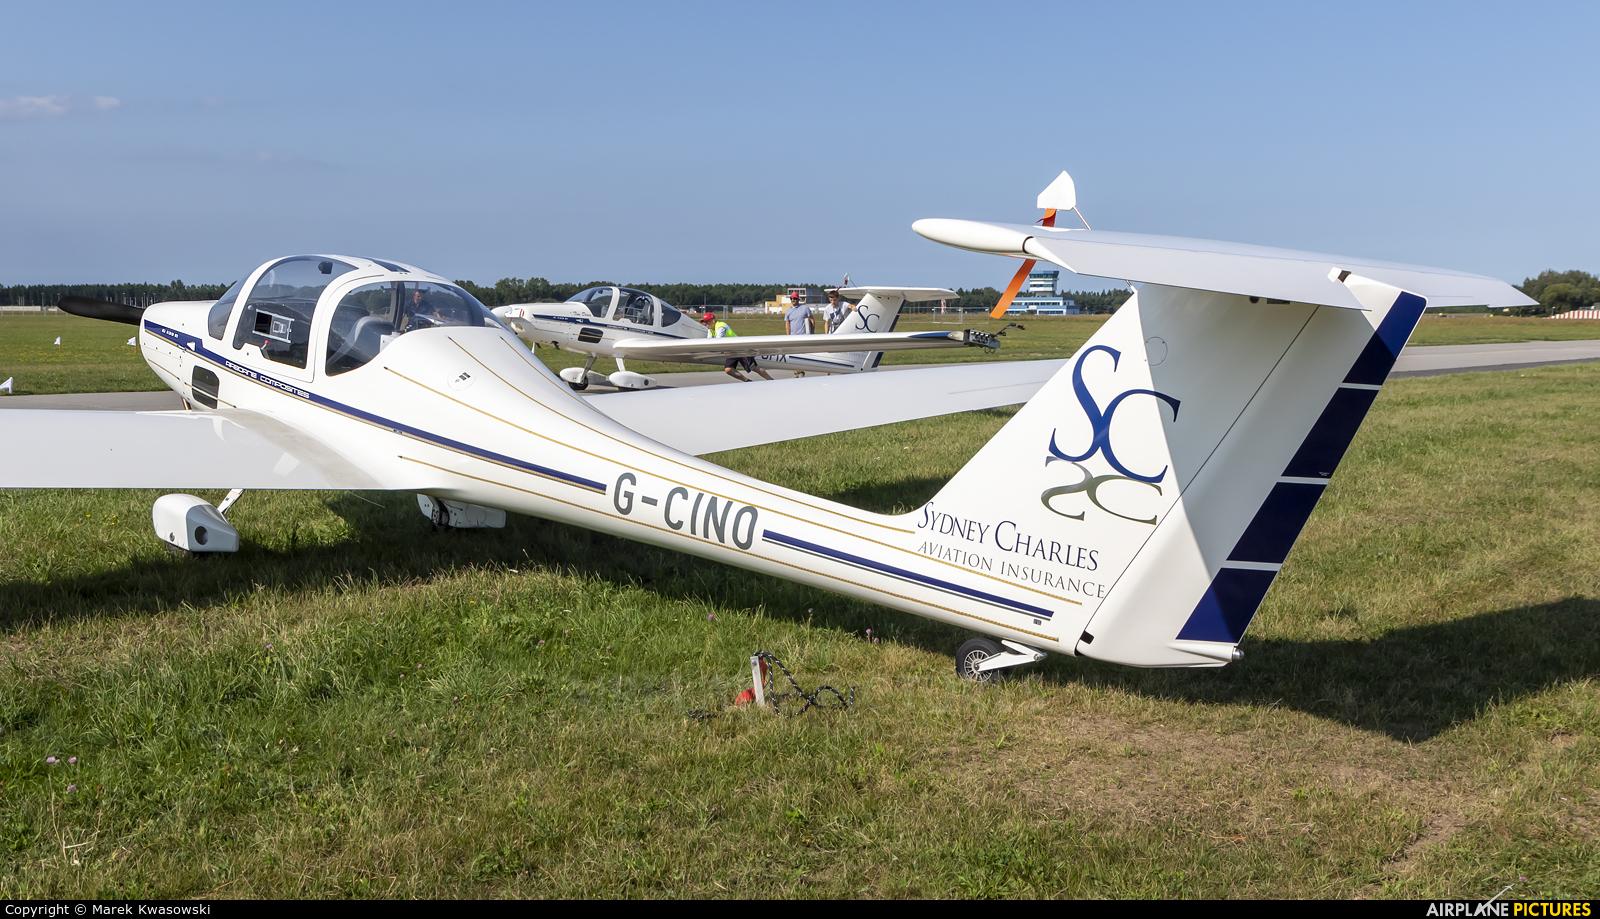 Aerosparx Display Team G-CINO aircraft at Gdynia- Babie Doły (Oksywie)